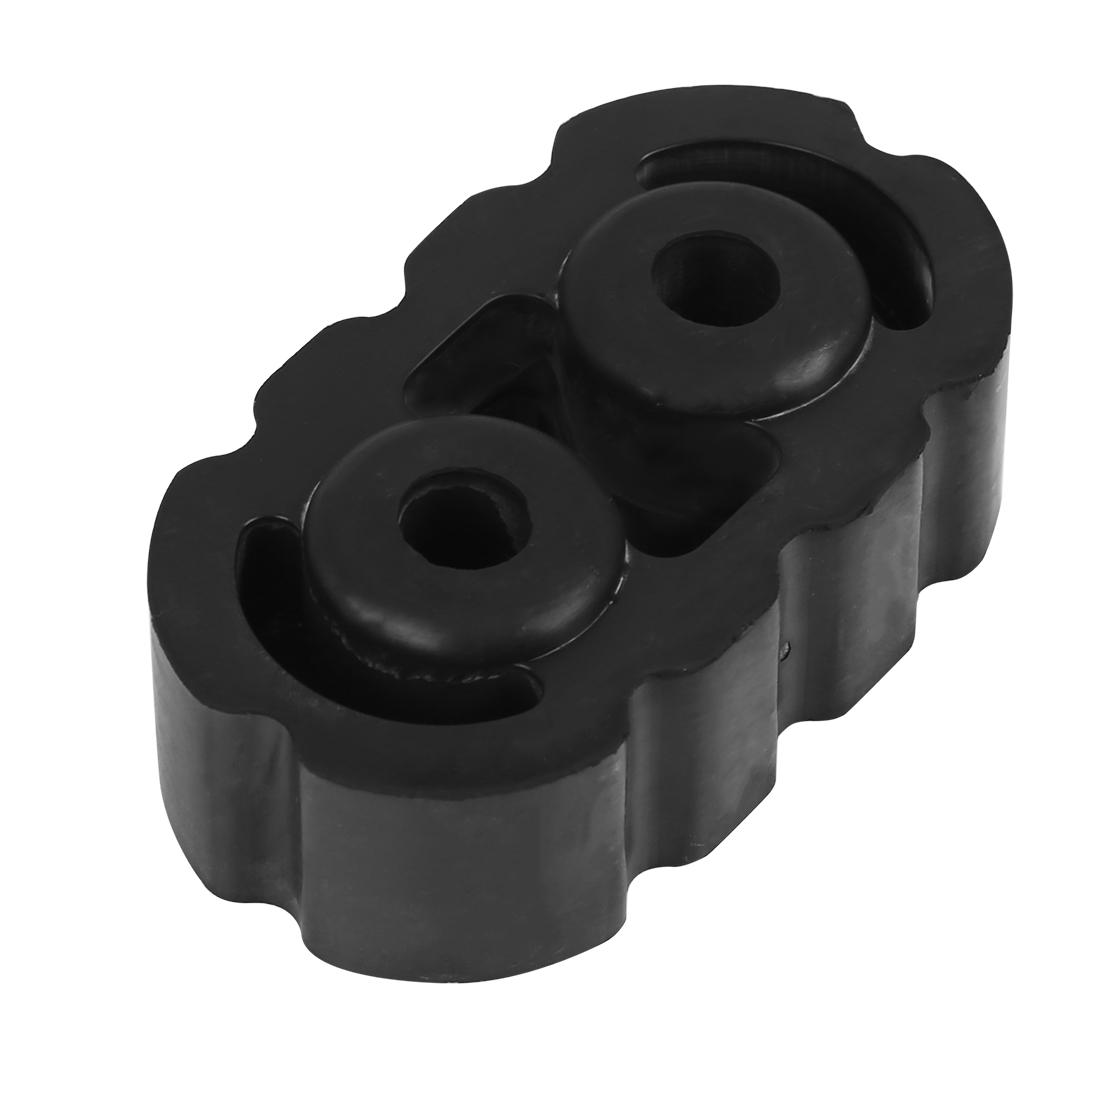 Car 2 Holes 10mm Dia Black Rubber Muffler Exhaust Hangers Bushing 77x43x28mm